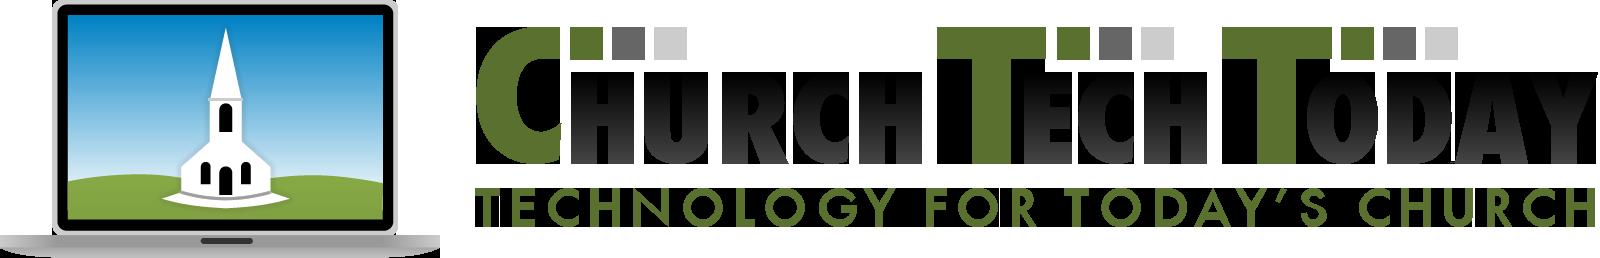 ChurchTechToday, Technology for Today's Church